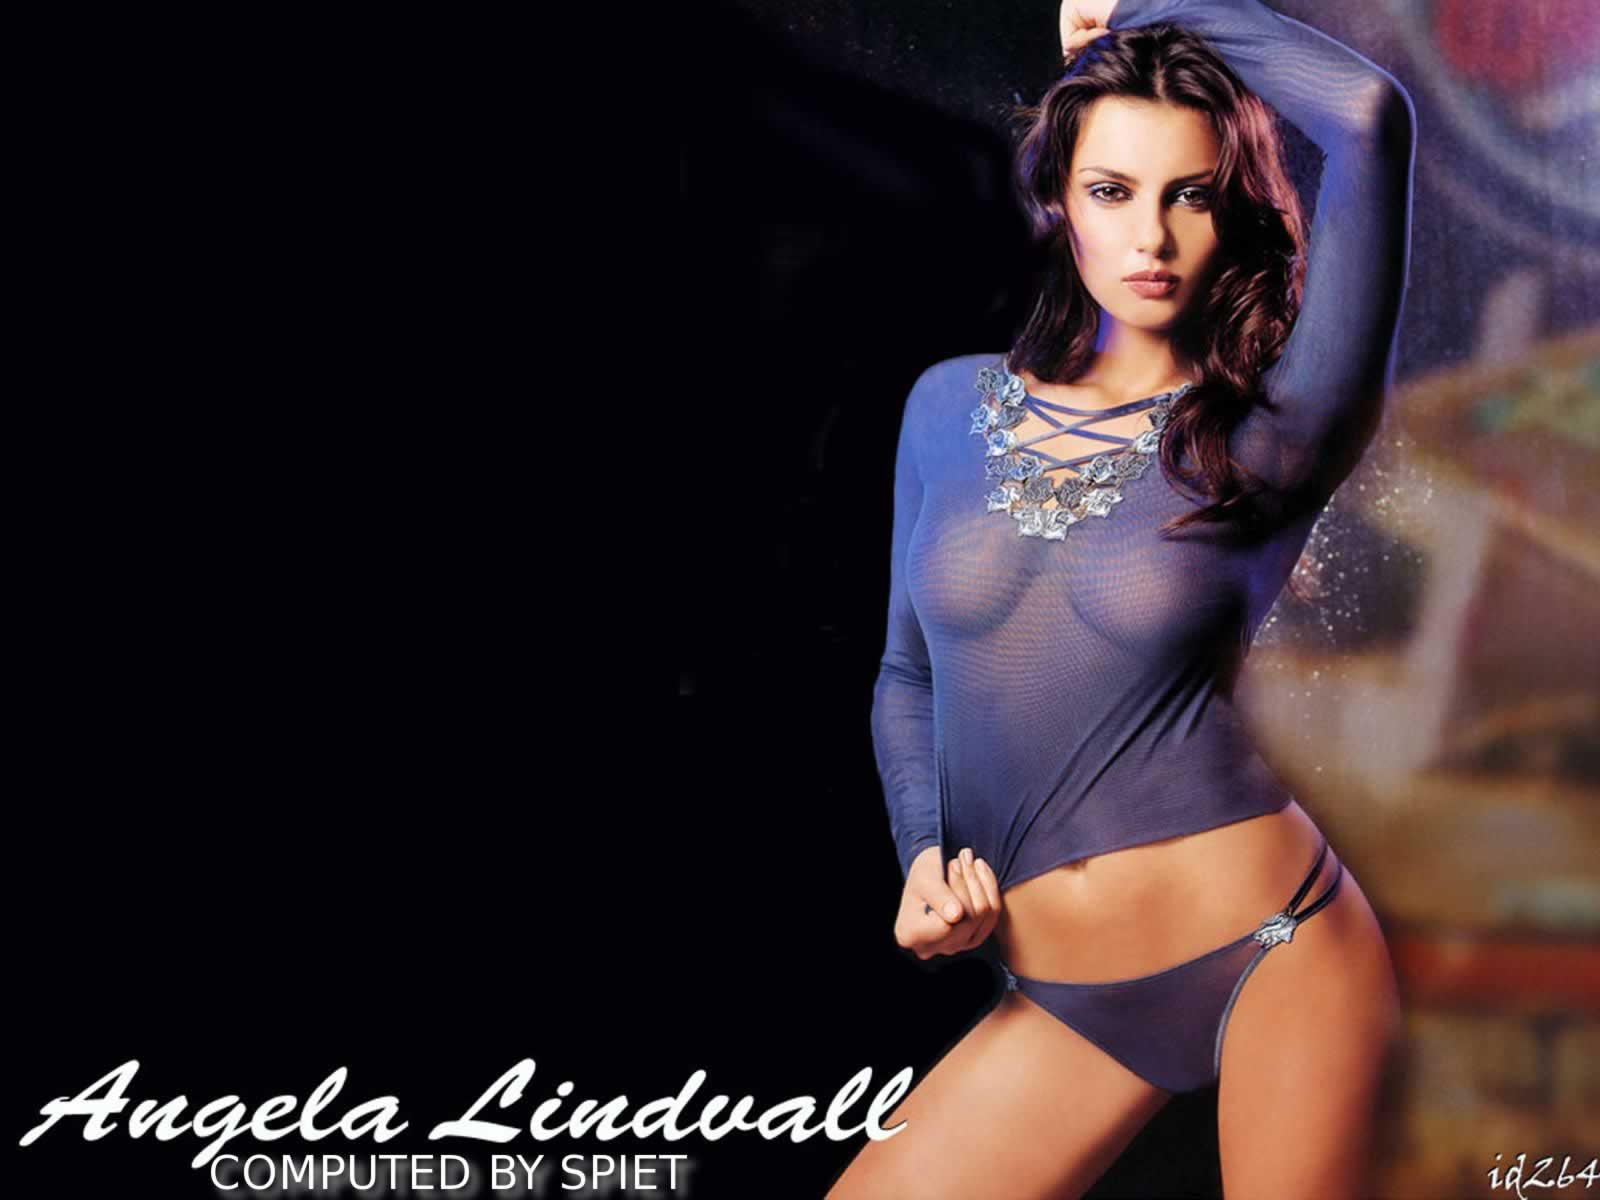 http://1.bp.blogspot.com/_p2EstT5Z5BU/THsrK11EoOI/AAAAAAAAArw/-1Gb7Ct00uU/s1600/Angela+Lindvall+Wallpapers+3.jpg